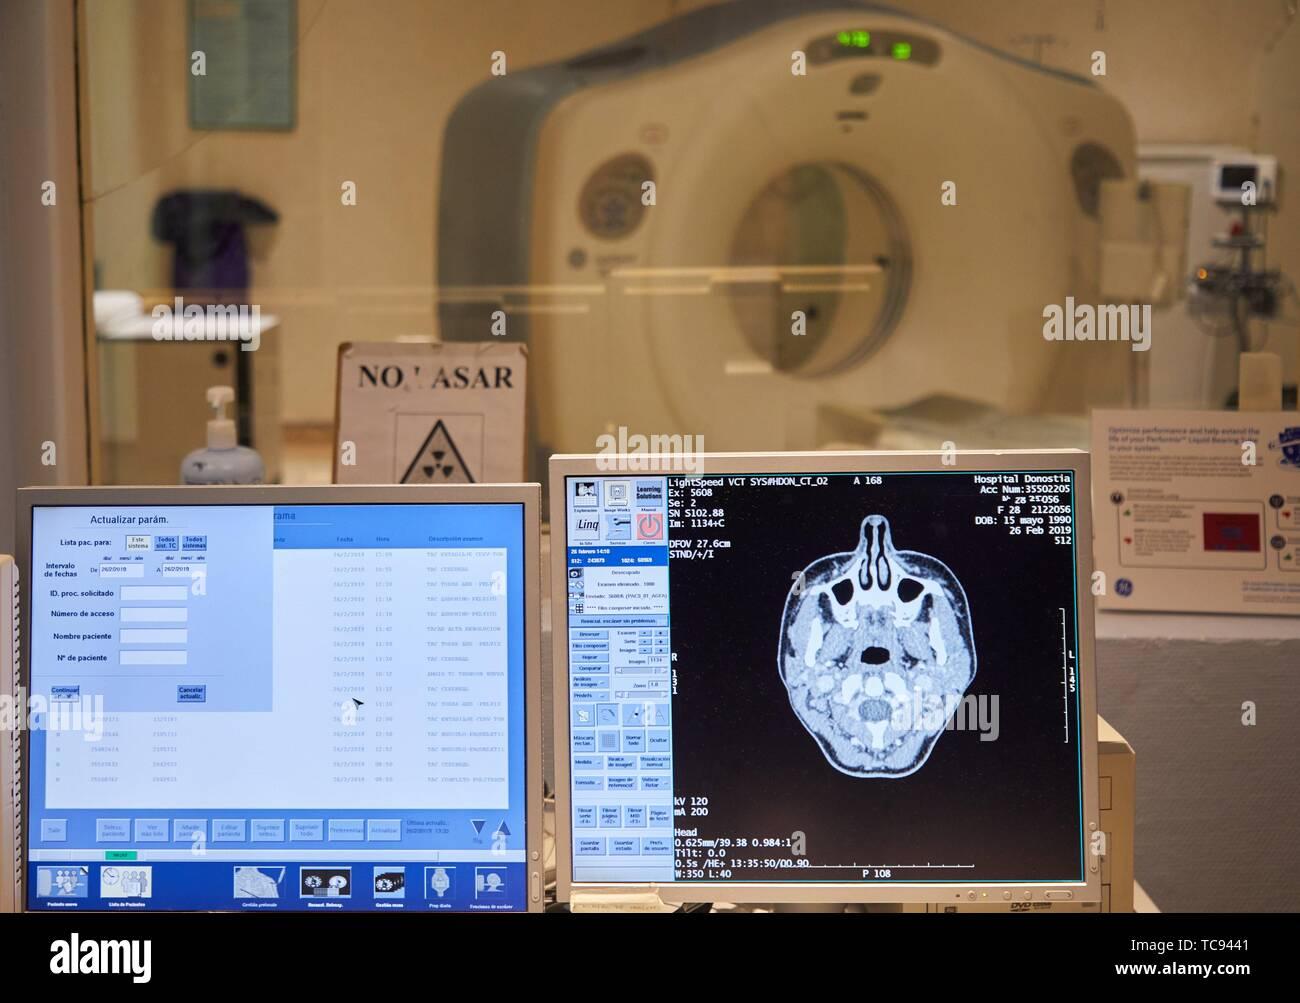 CT Scan, Radiology, Hospital Donostia, San Sebastian, Gipuzkoa, Basque Country, Spain - Stock Image